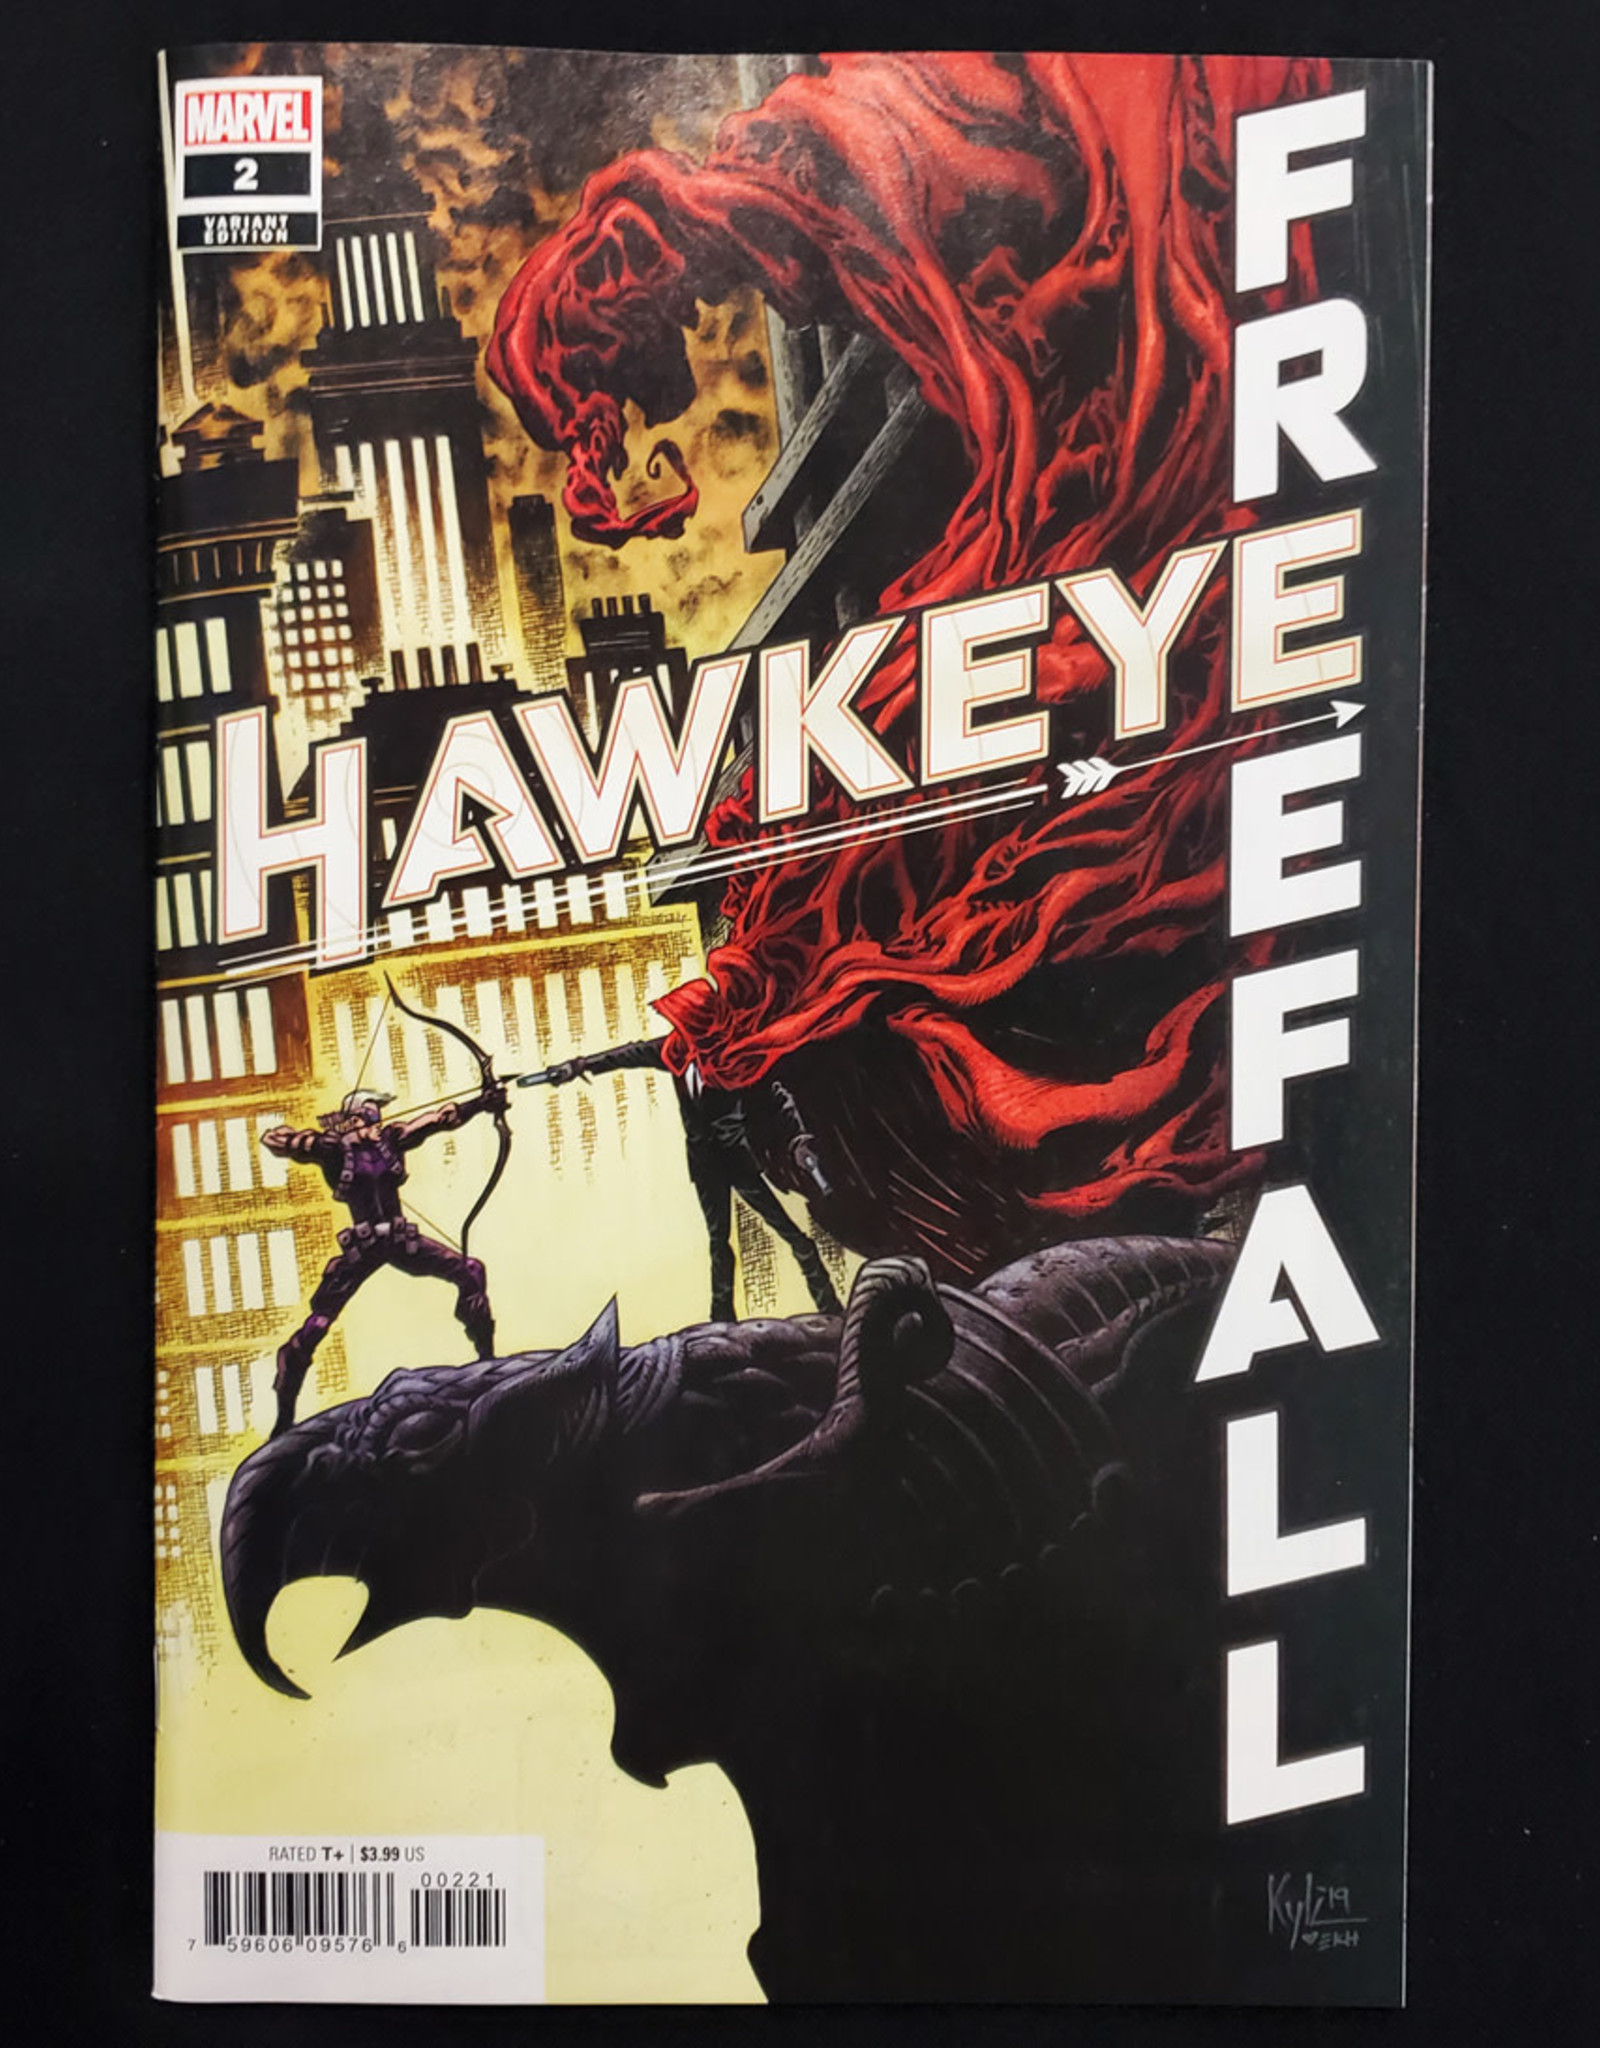 MARVEL COMICS HAWKEYE FREE FALL #2 HOTZ VARIANT